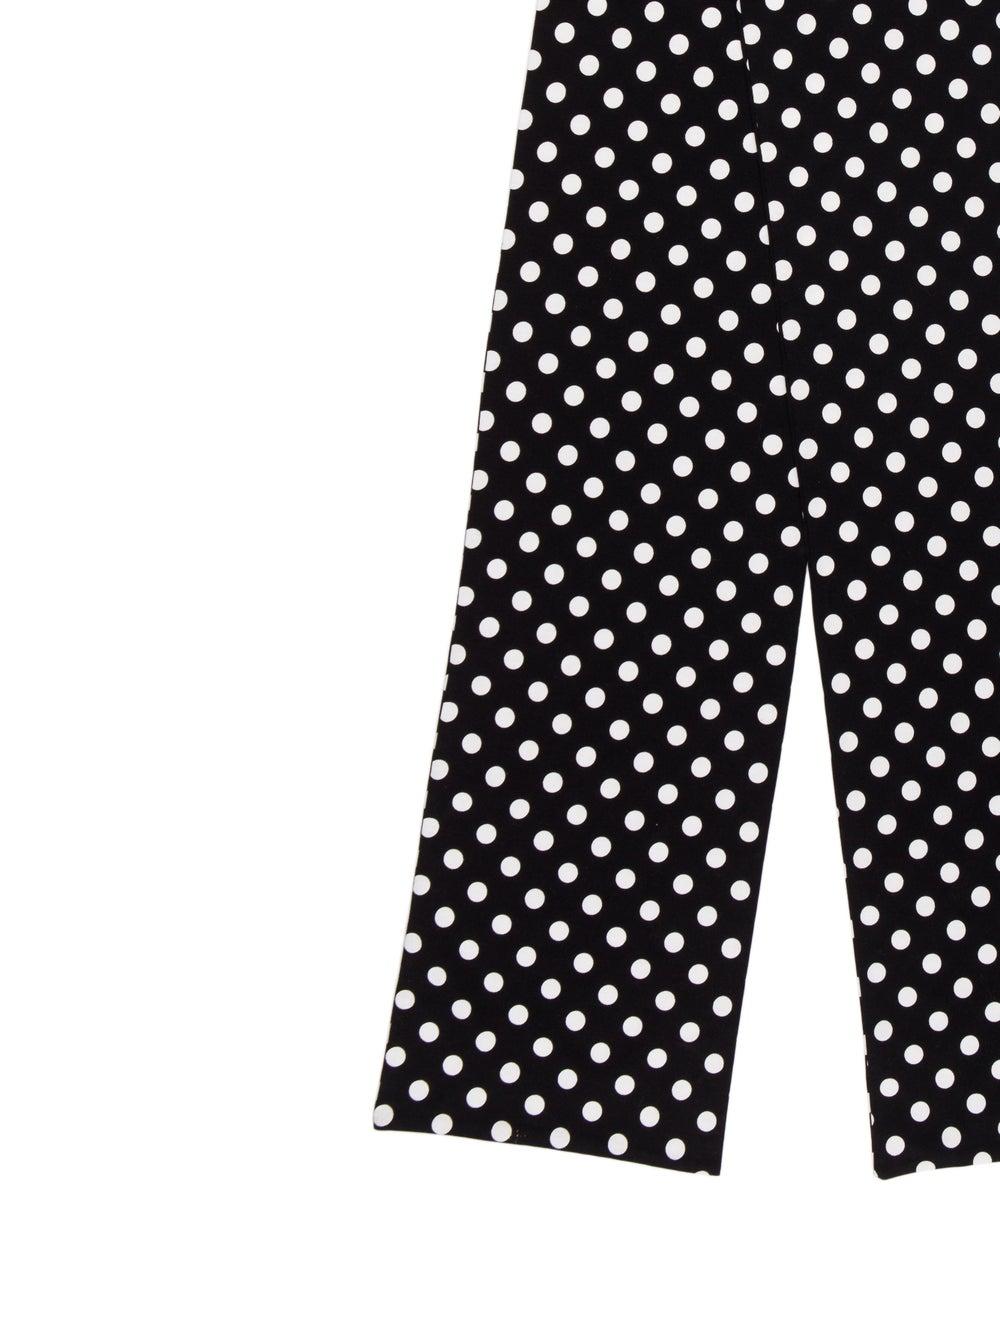 Marimekko Polka Dot Woven Scarf Black - image 2